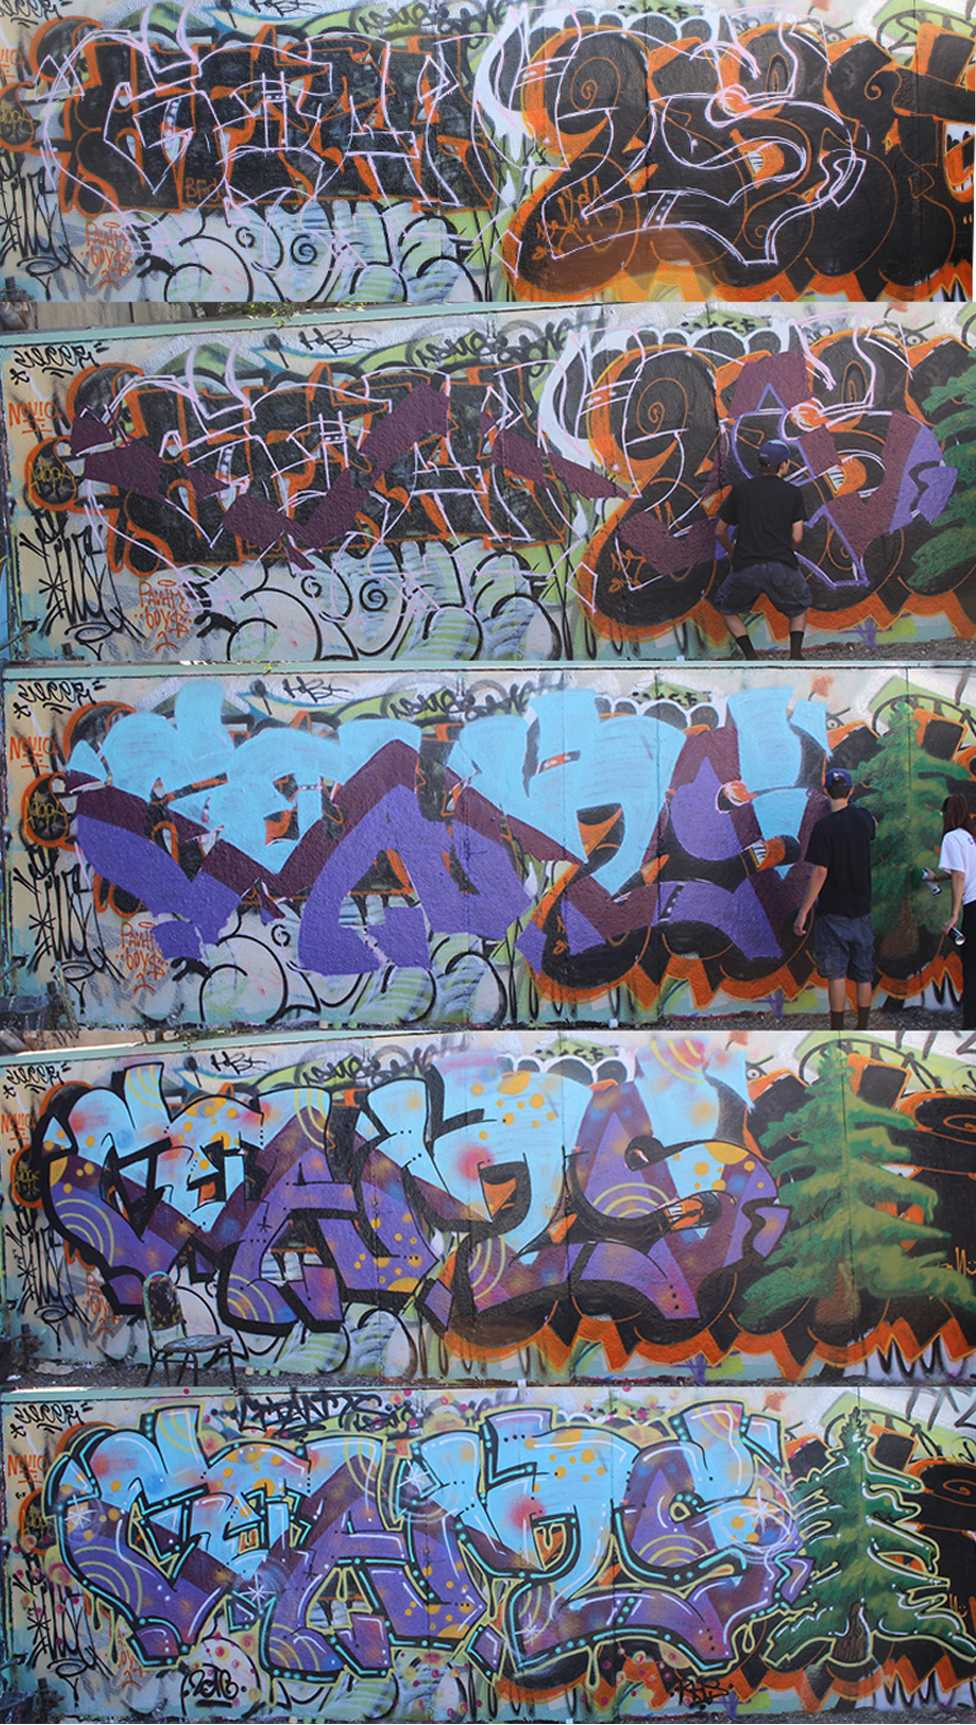 revisitedgraffitiprogression